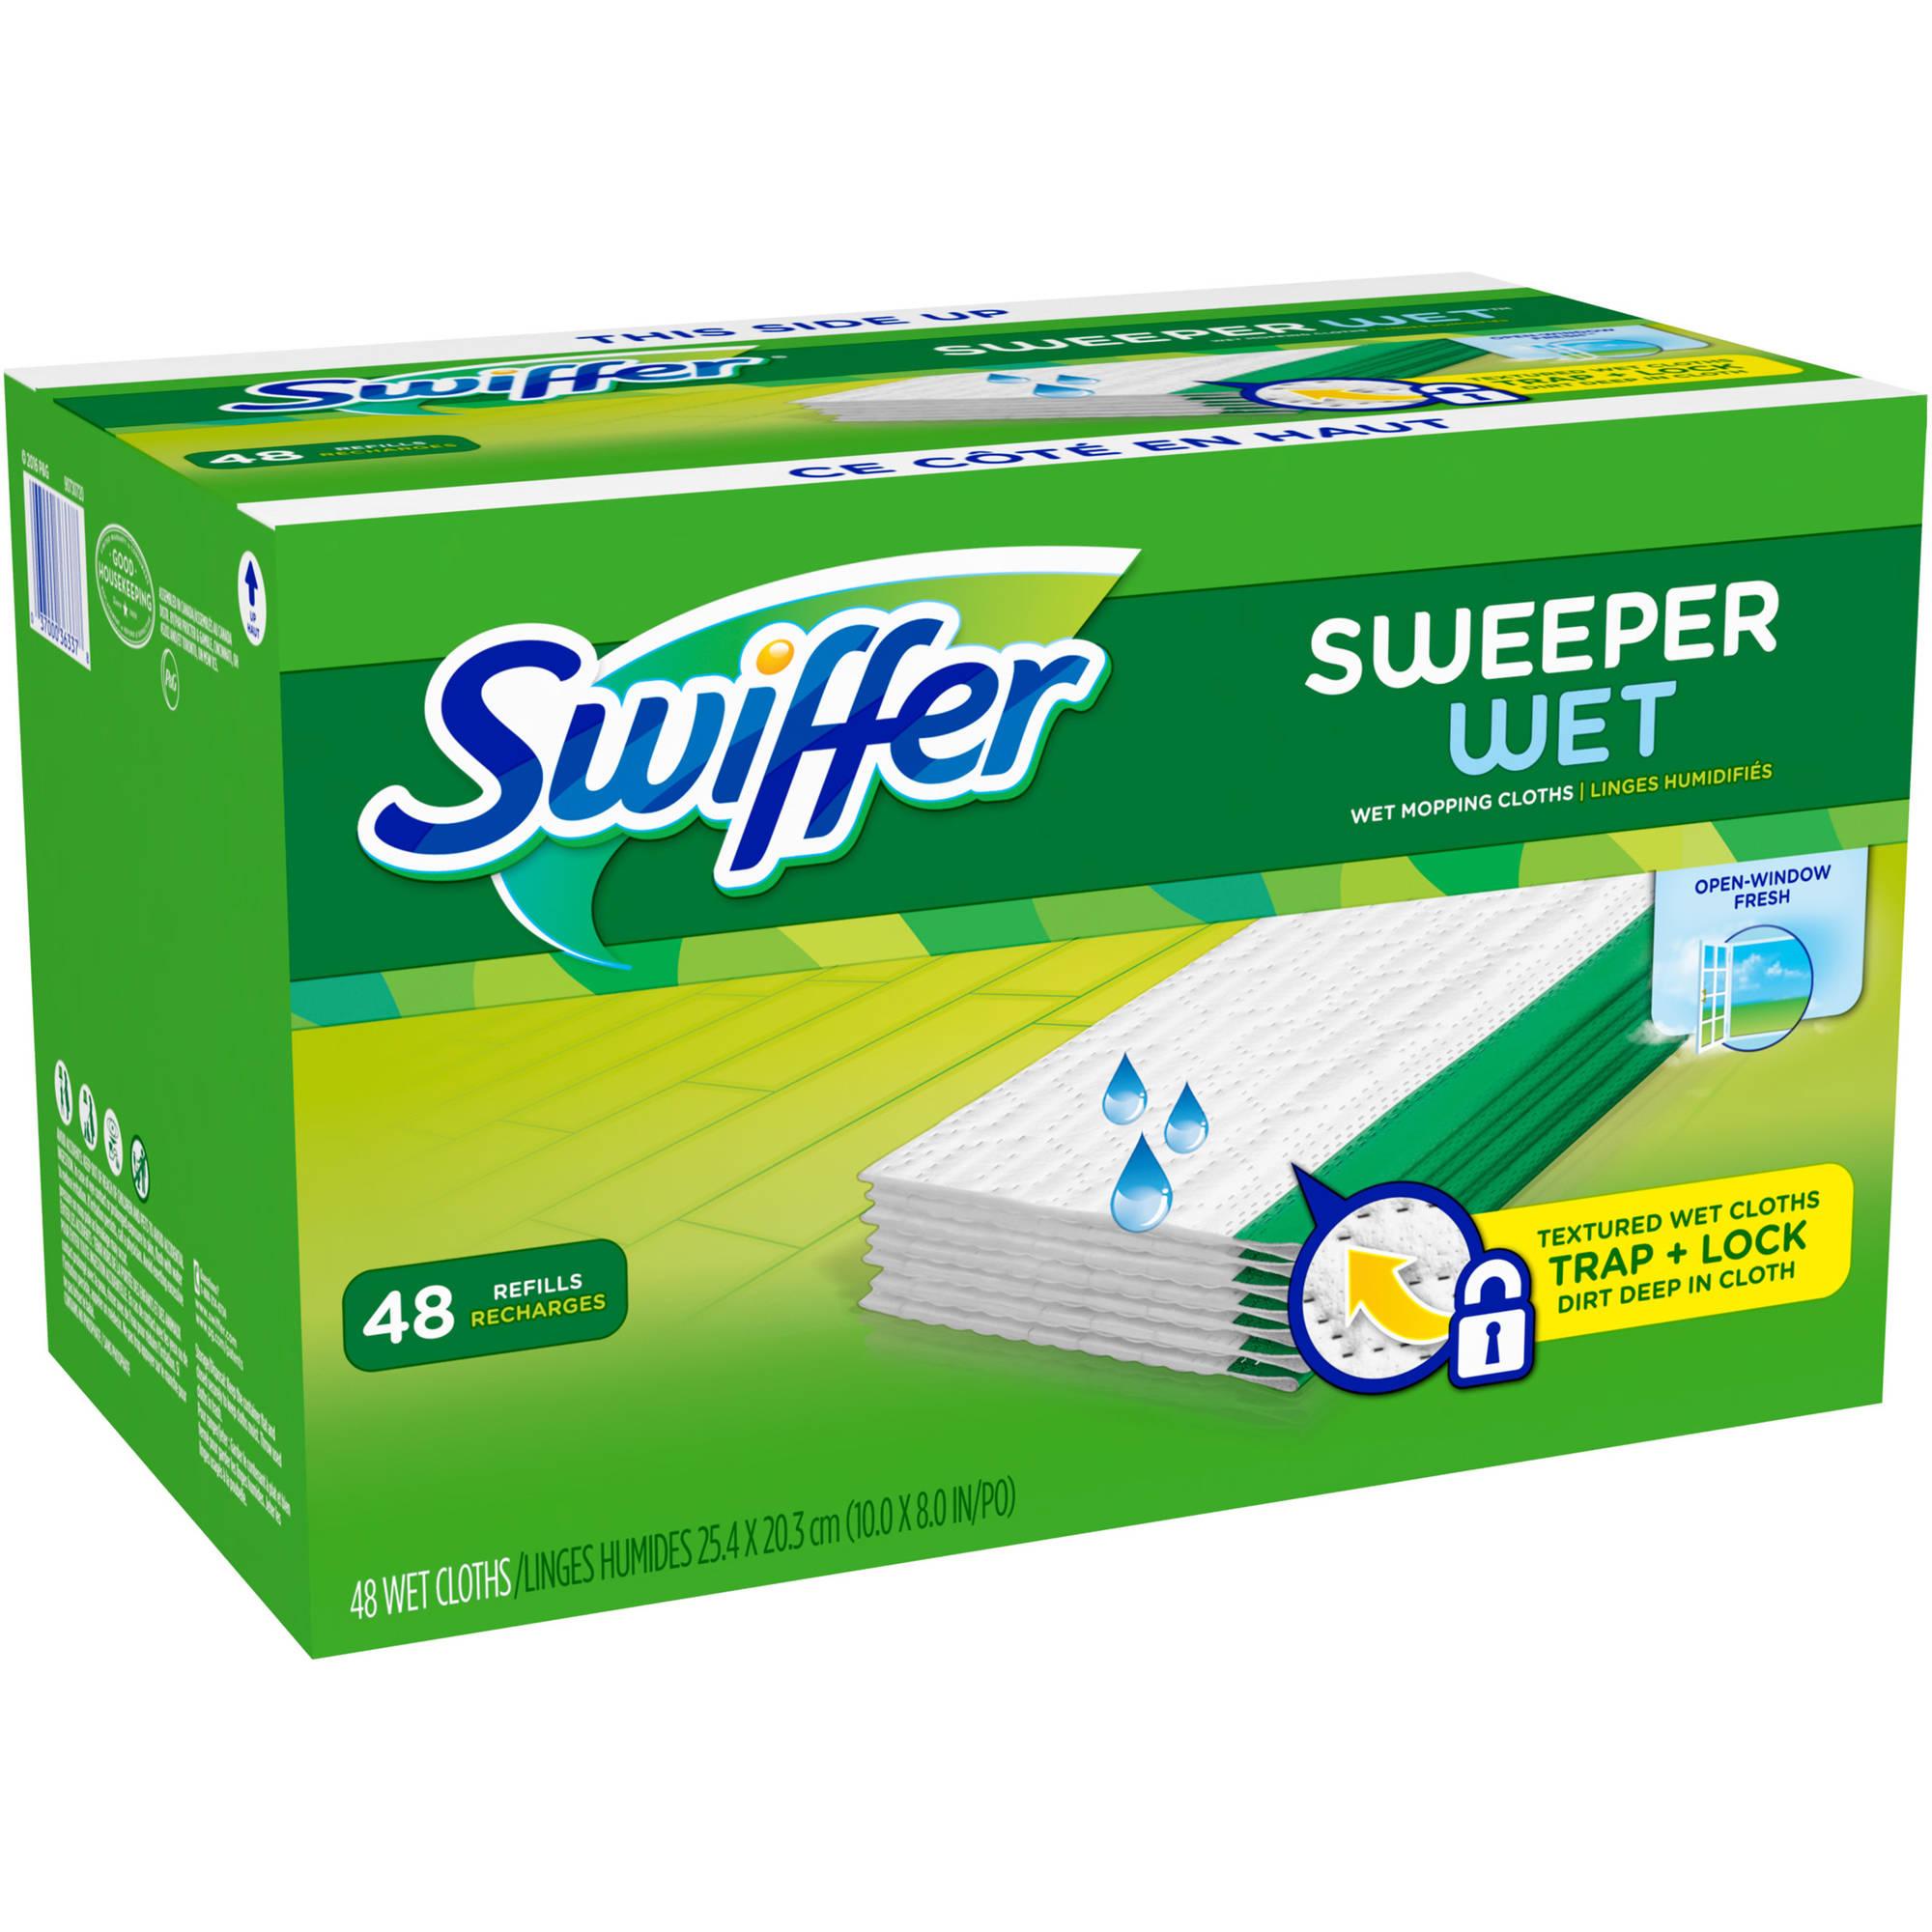 Swiffer 48 Pcs Sweeper Wet Mopping Cloths Refills Mop